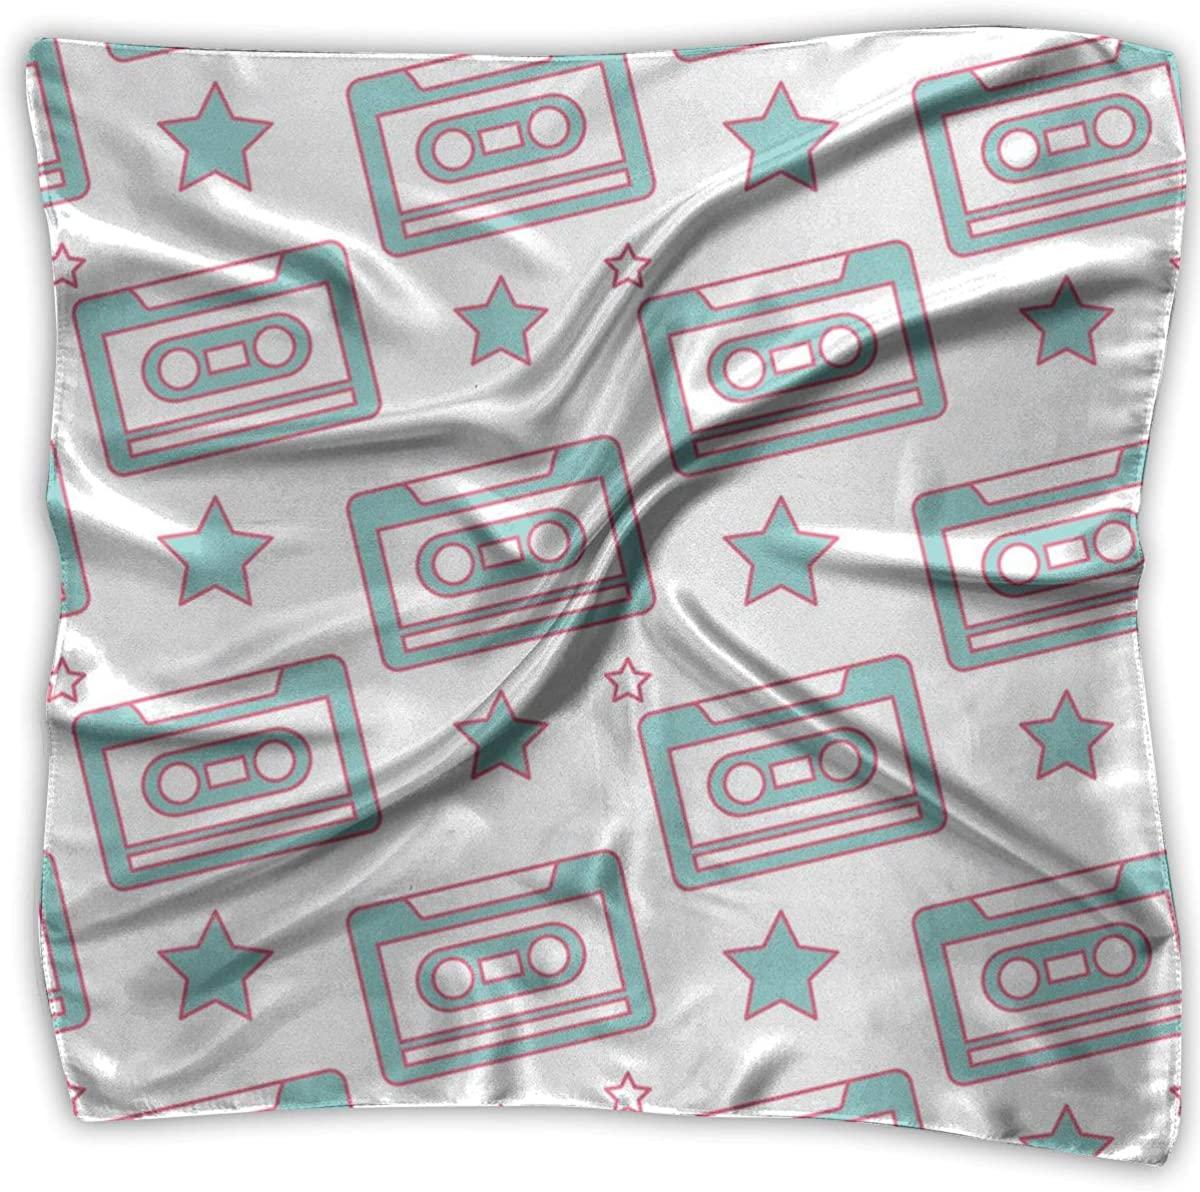 Pattern Retro Cassette Tape Square Handkerchiefs Shawl Bandanas Headscarf Neckerchief Headband